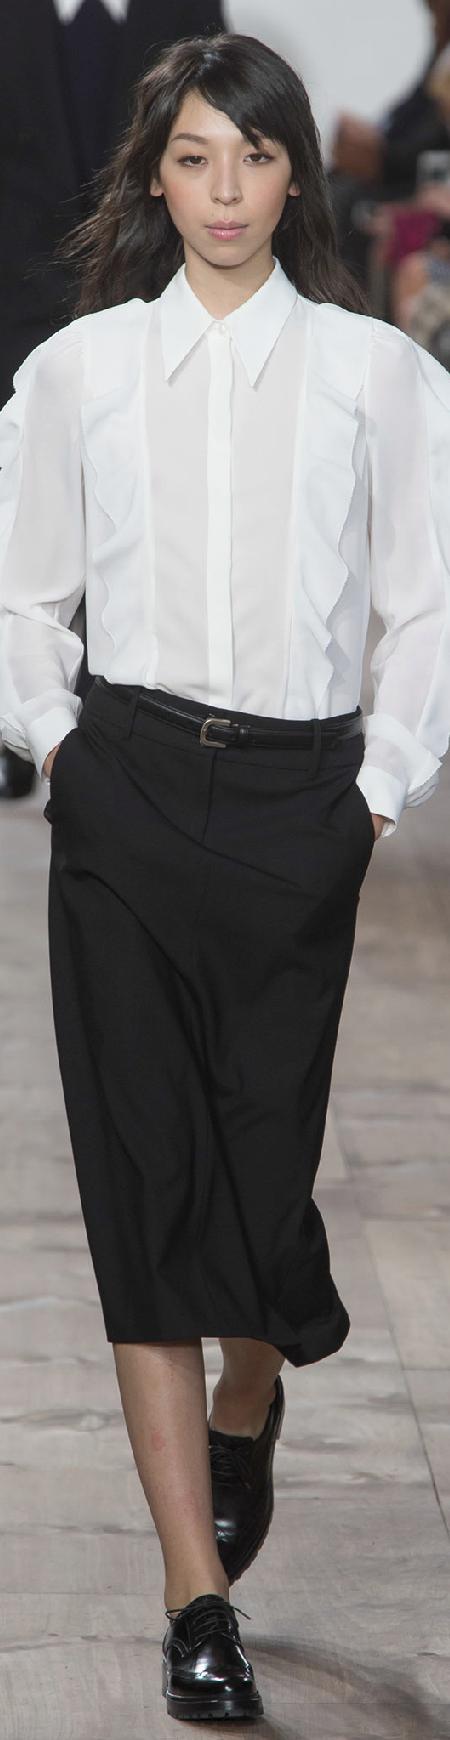 #Modest doesn't mean frumpy. www.ColleenHammond.com  Fall 2015 Ready-to-Wear Michael Kors